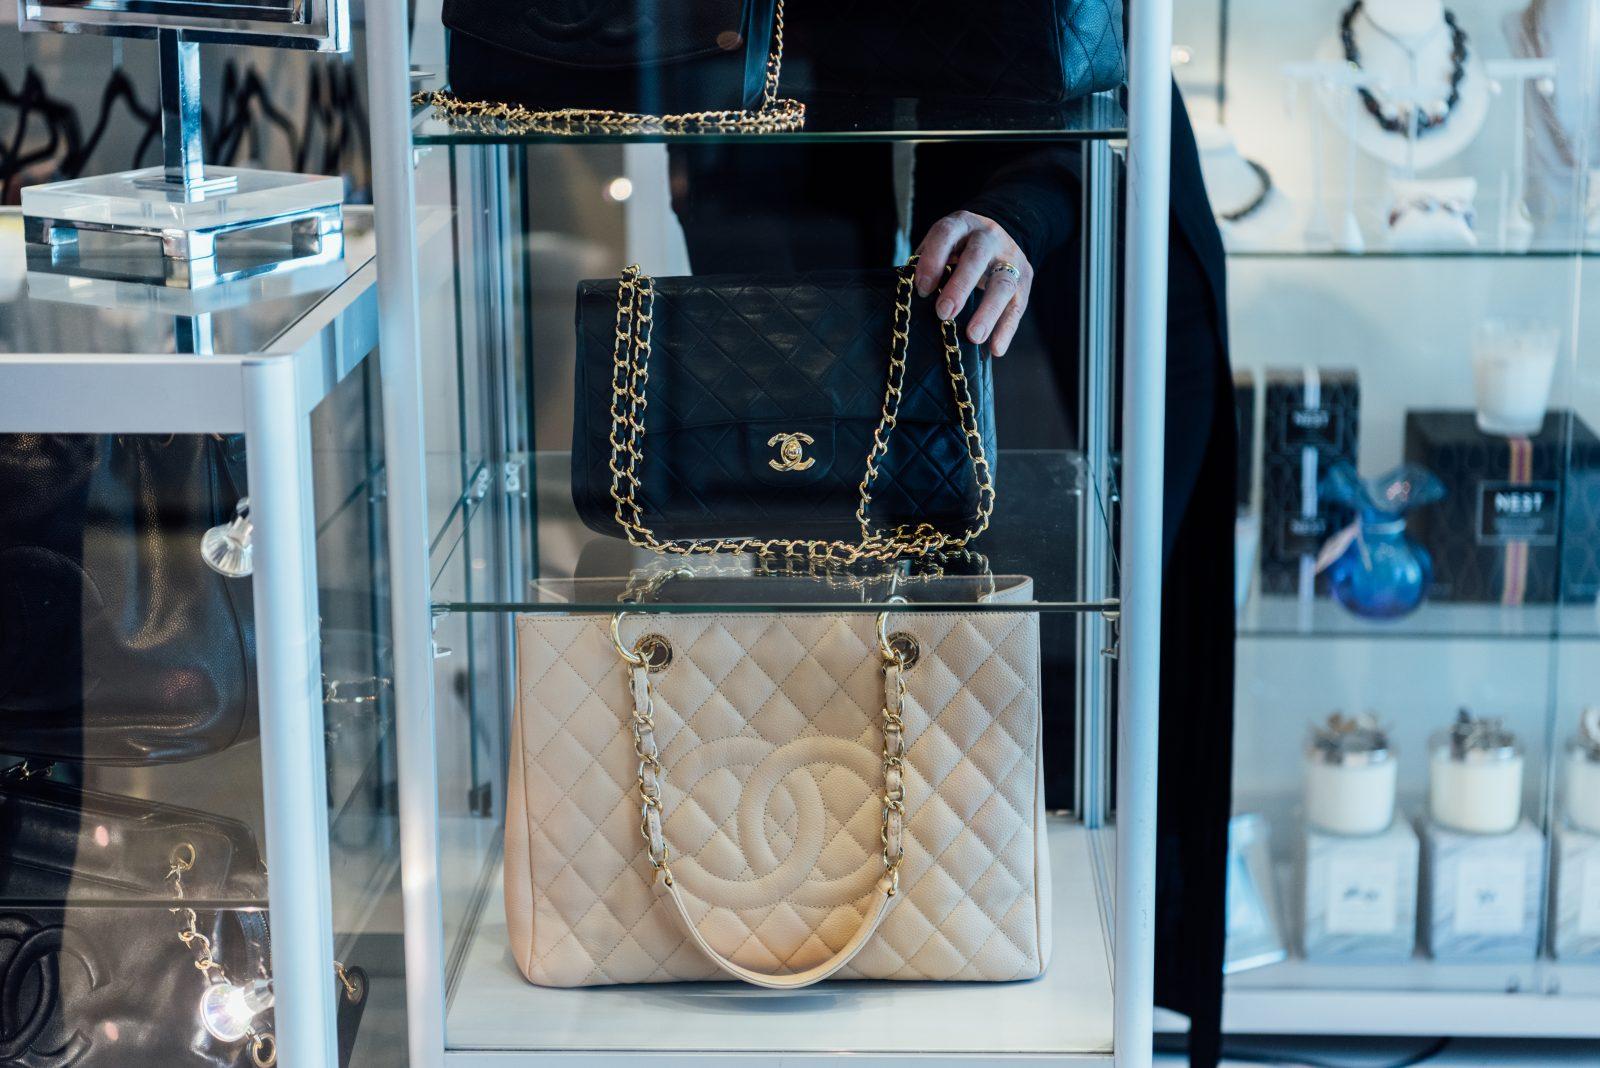 Chanel bags at Gus Mayers